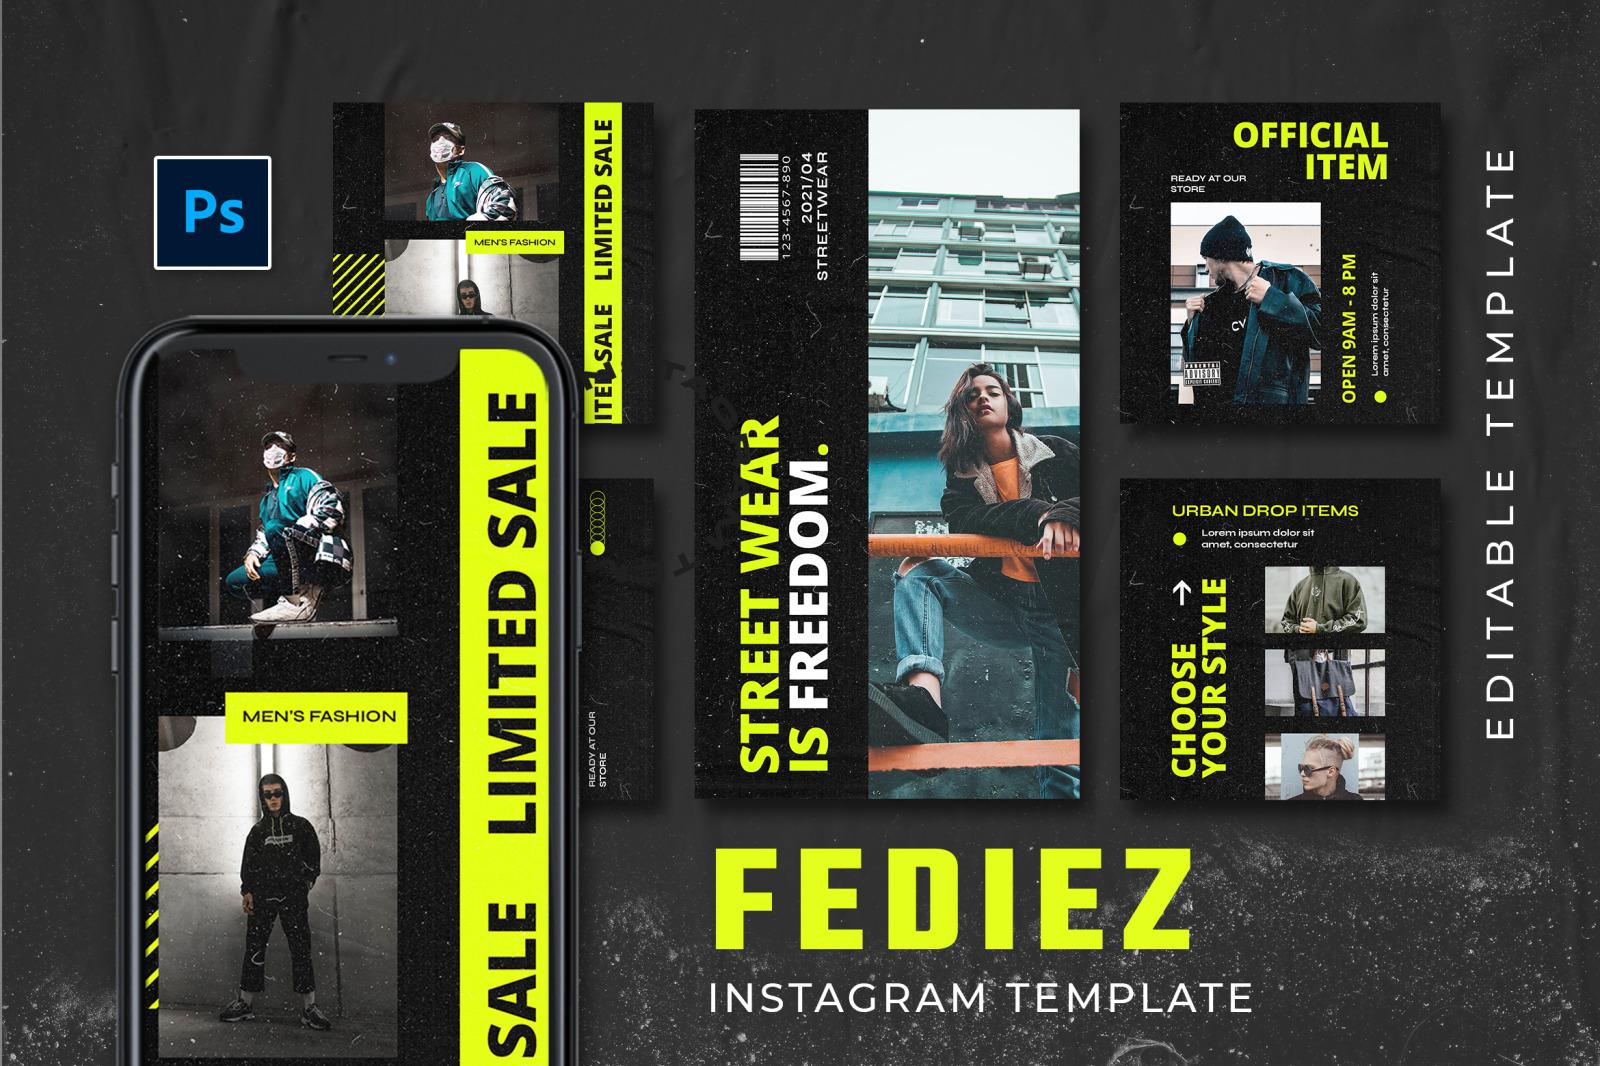 Fediez Instagram Template